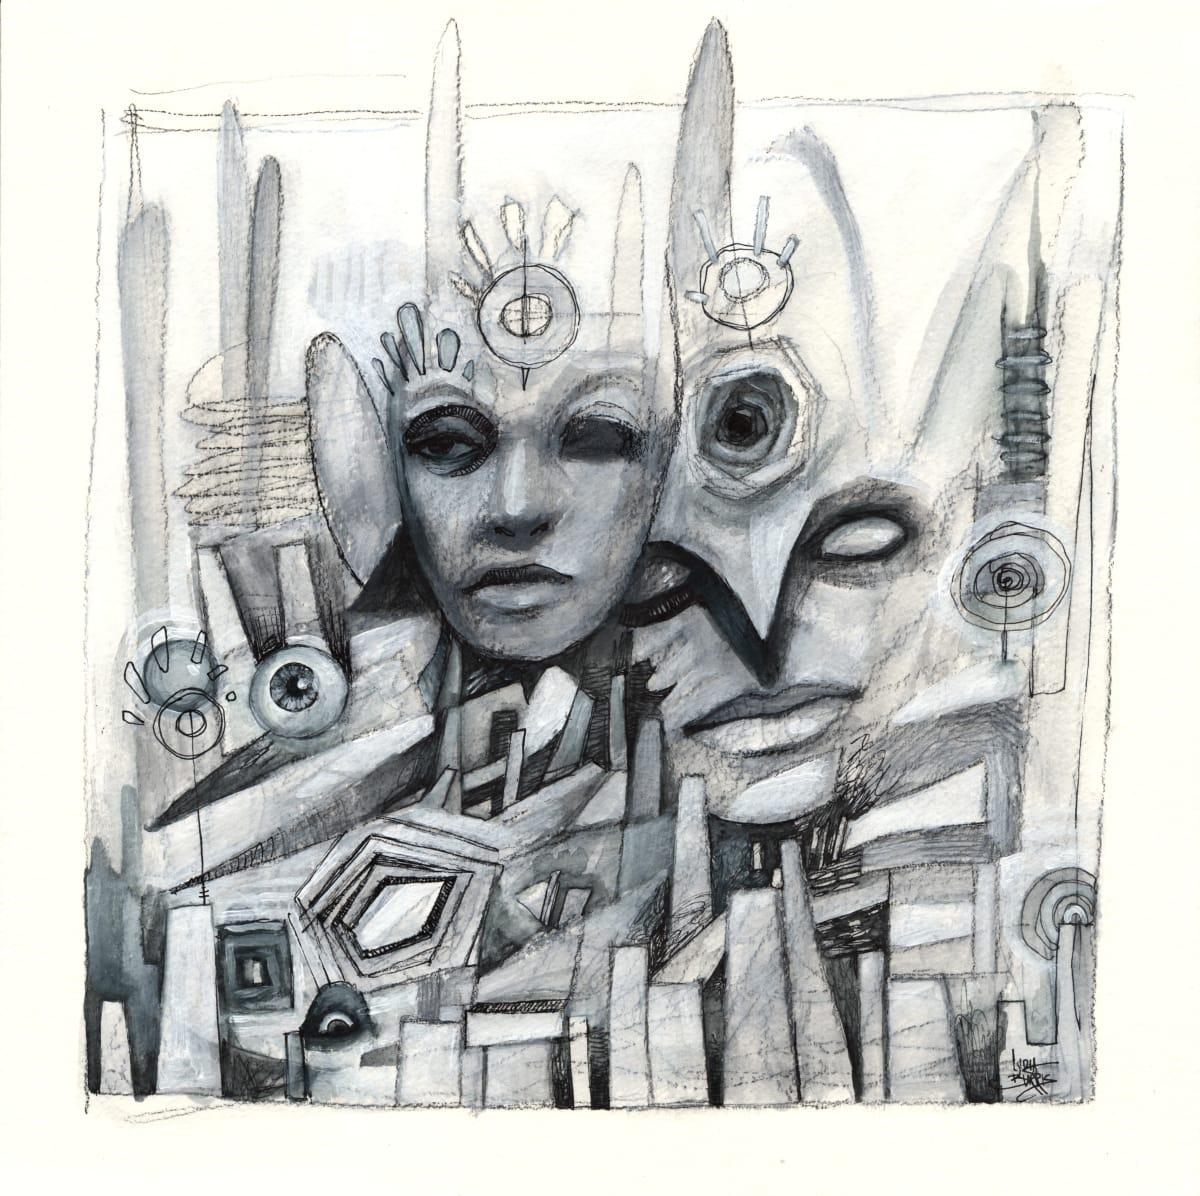 The Architect's Spirit Dream by Lydia Burris